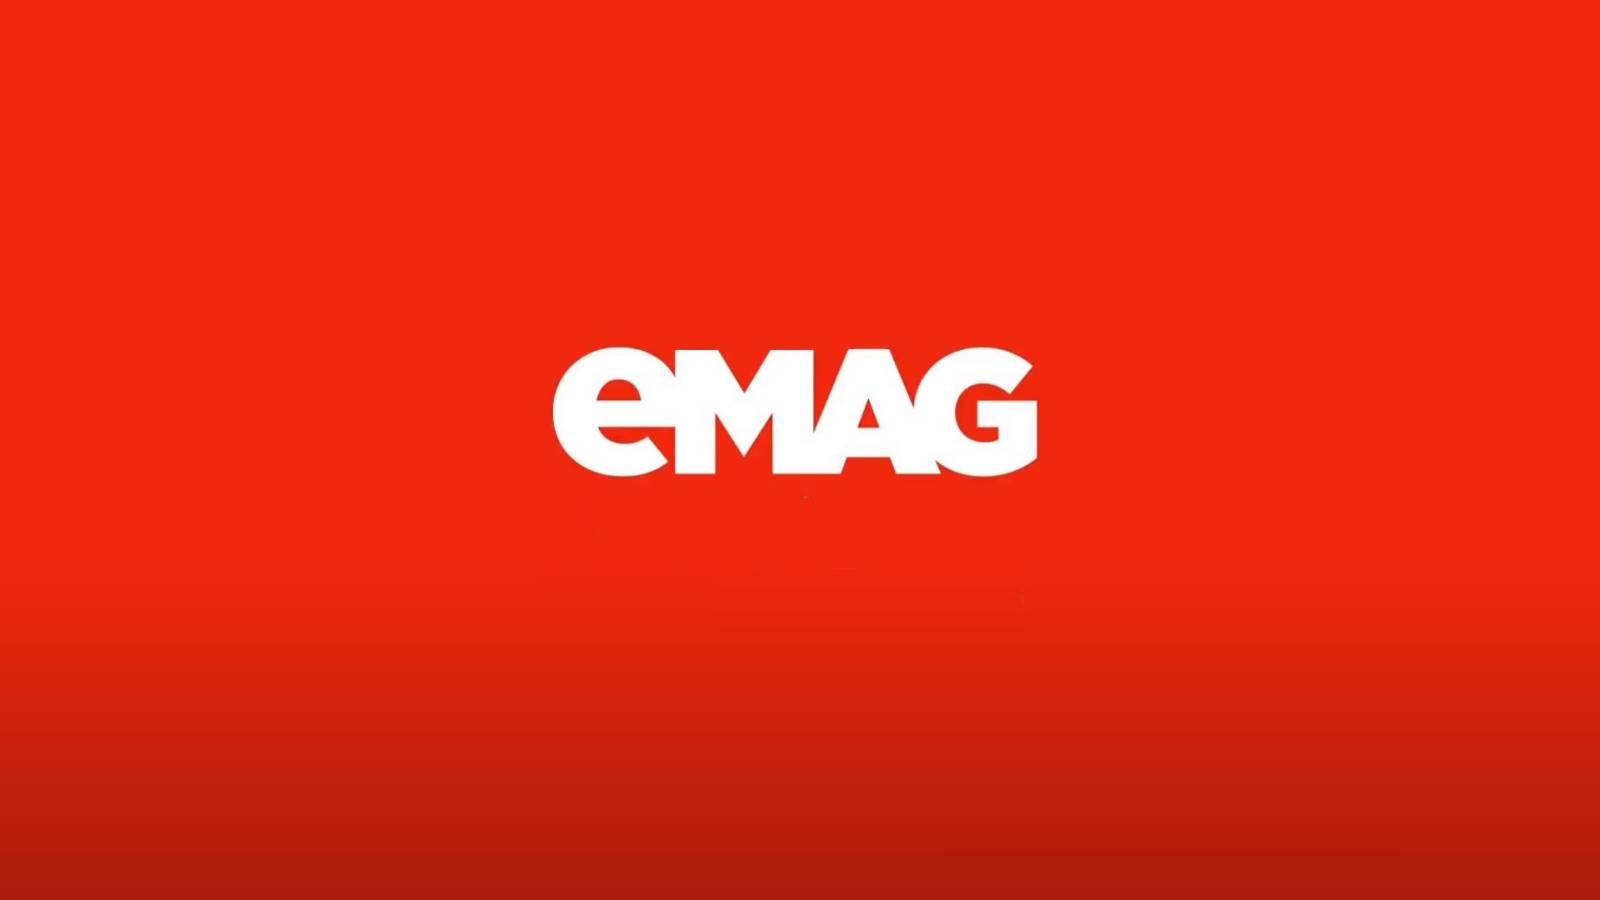 emag amenda marketplace